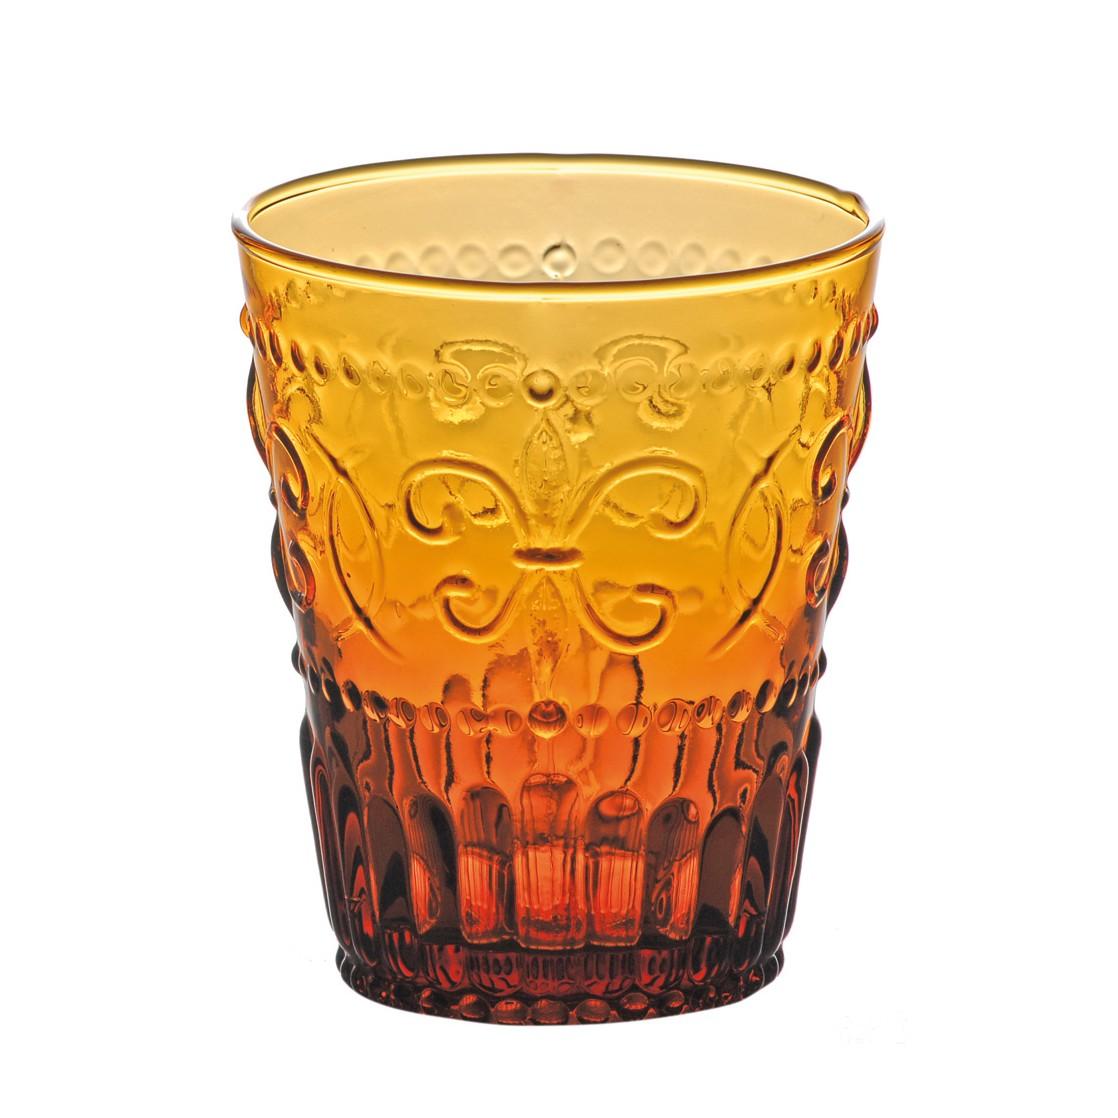 trinkglas firenze 6er set glas bernstein bitossi home g nstig online kaufen. Black Bedroom Furniture Sets. Home Design Ideas